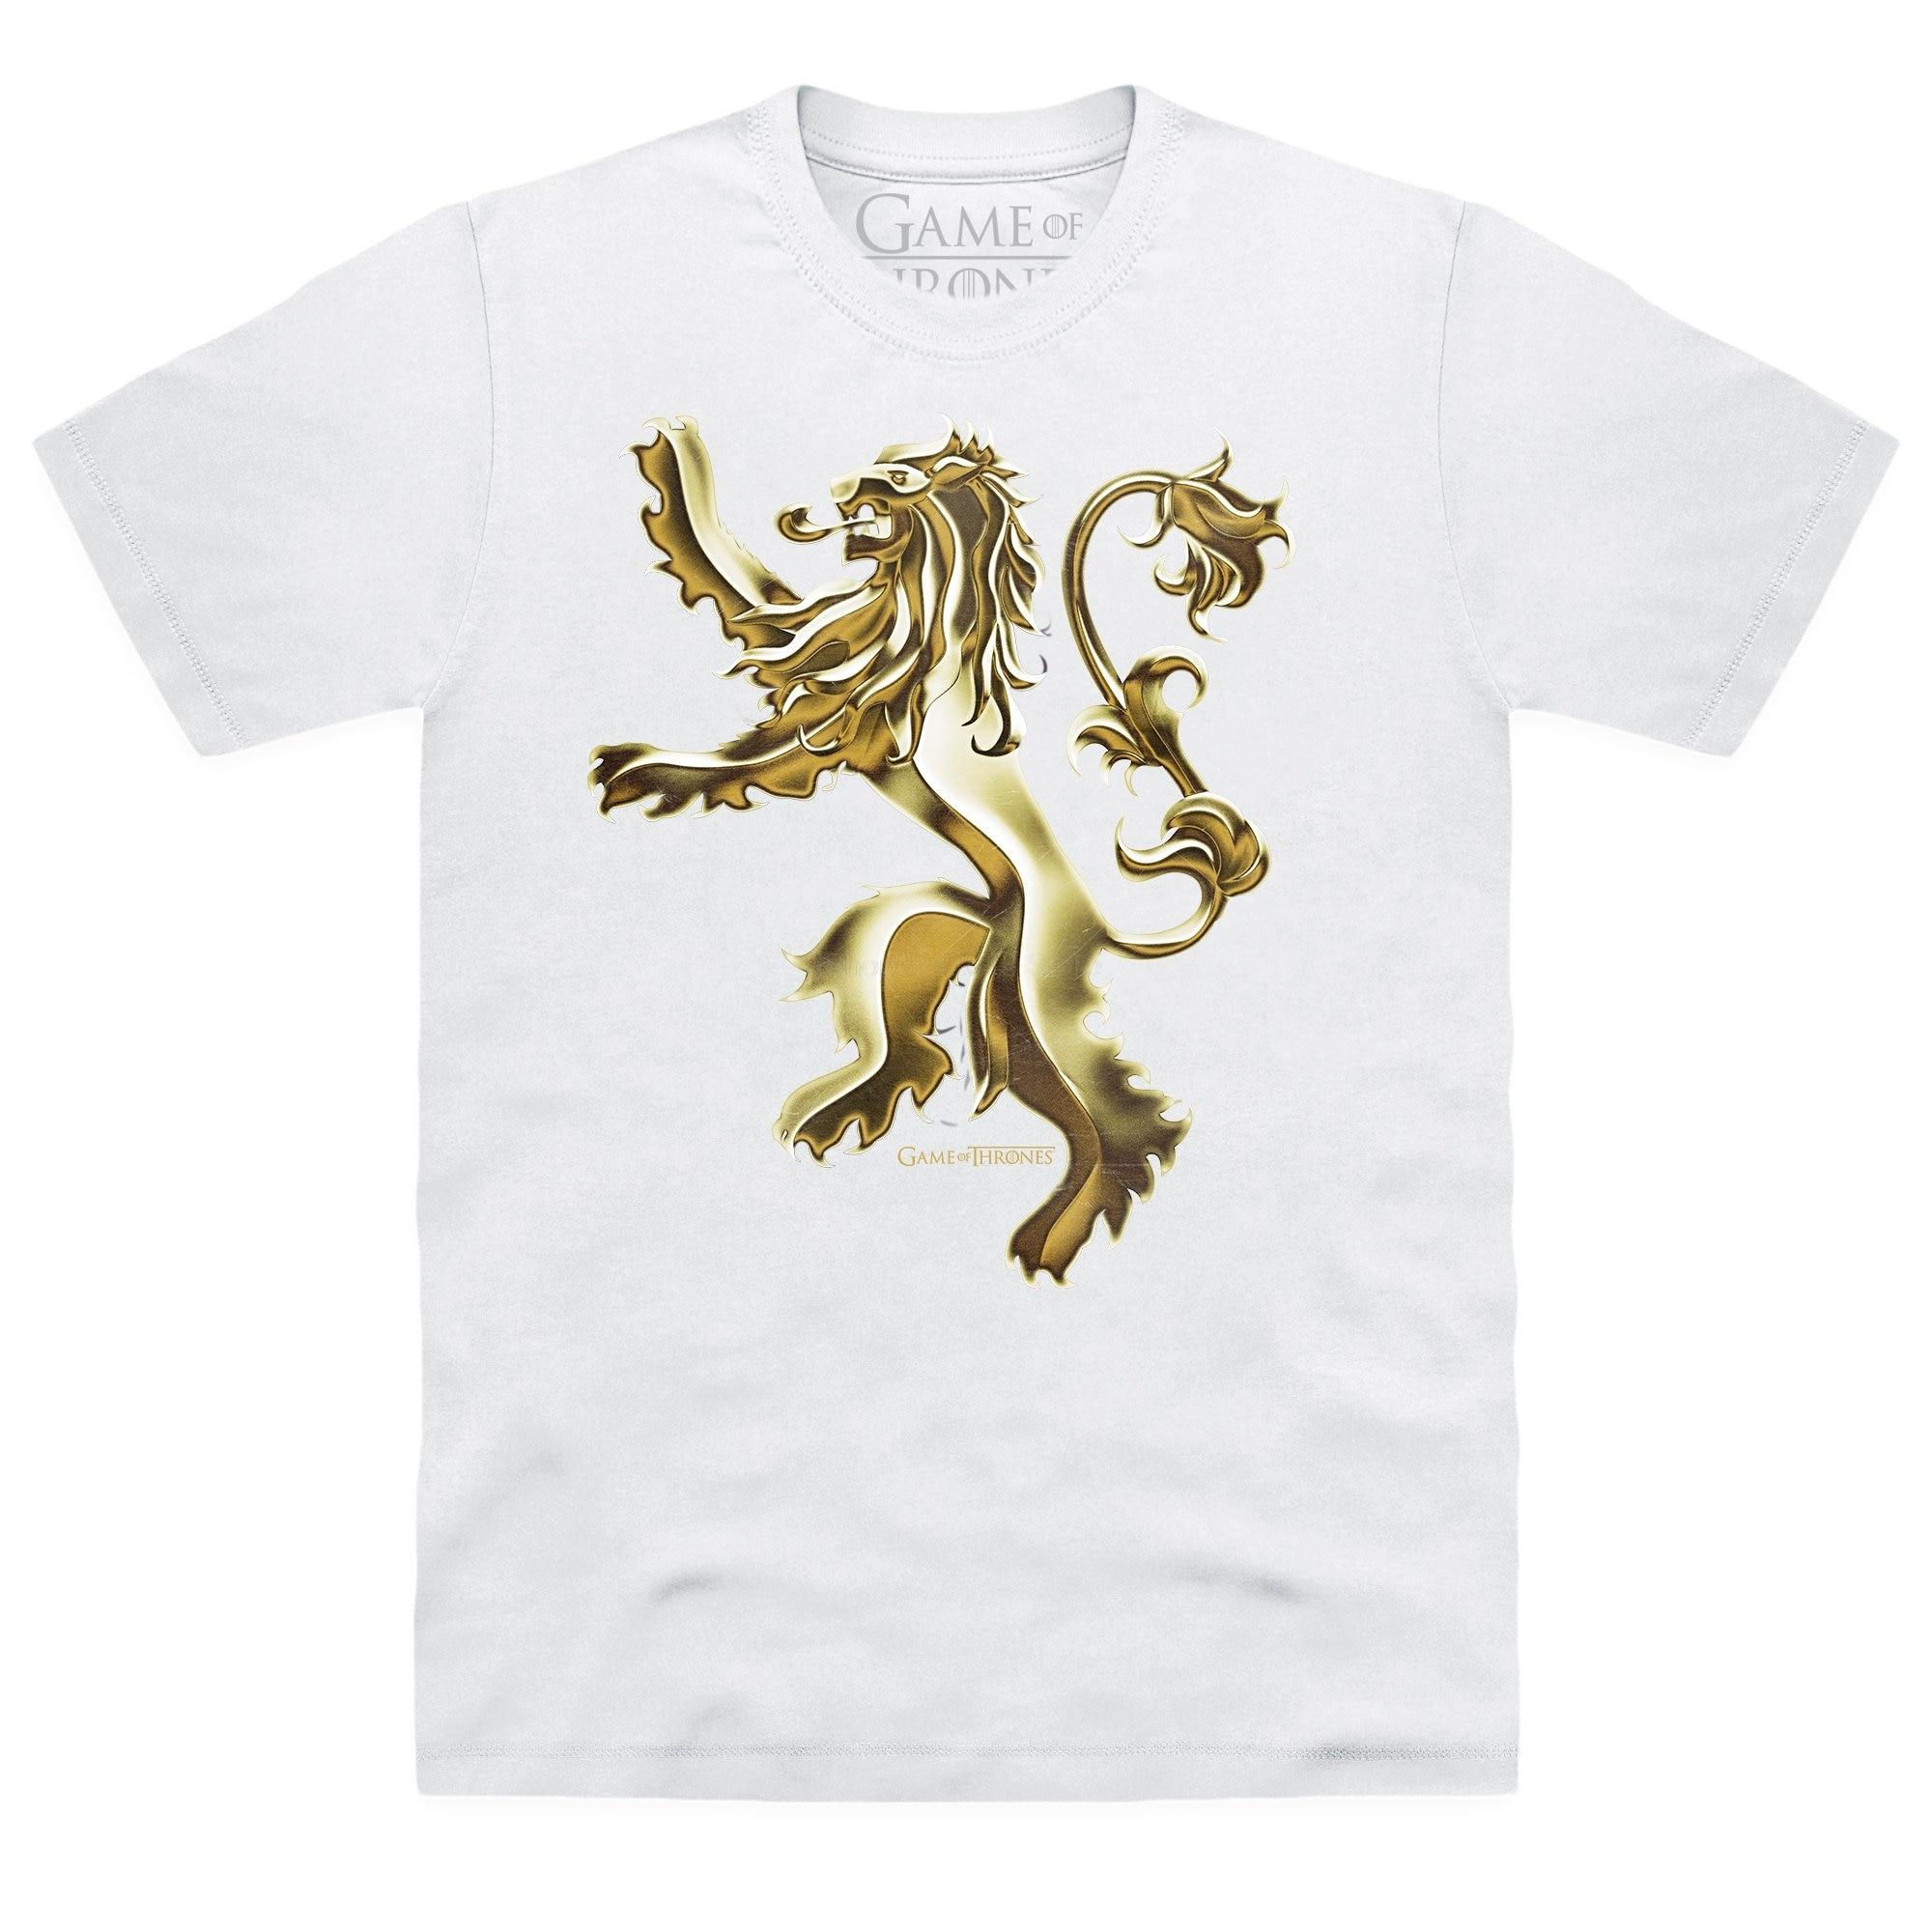 Gildan Brand Game Of Thrones - House Lannister Metallic T-Shirt 2019 Summer Short Sleeve T-Shirt